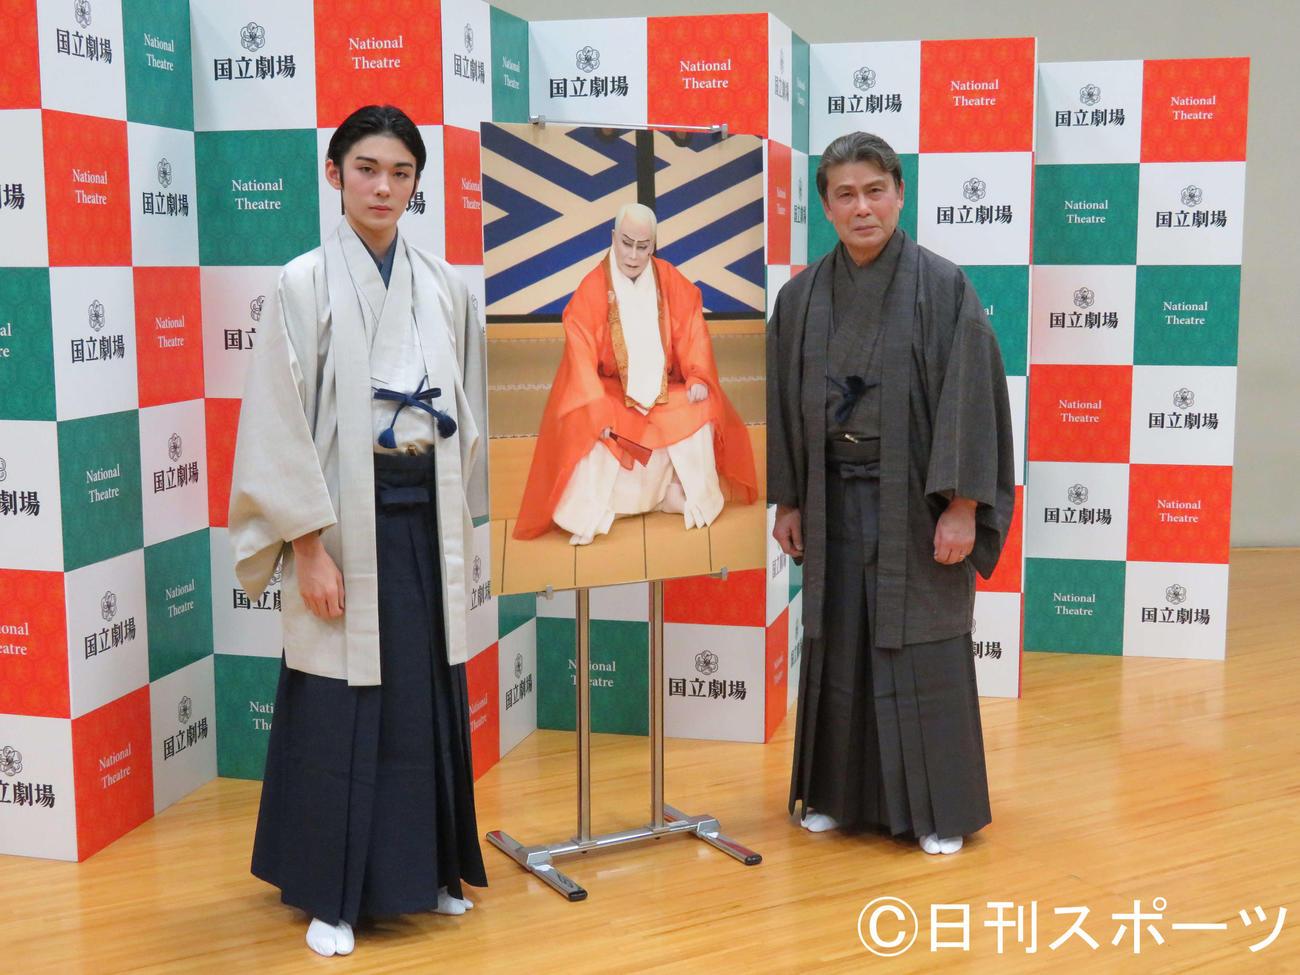 「国立劇場12月歌舞伎公演」の取材会に出席した市川染五郎(左)と松本白鸚(撮影・三須佳夏)